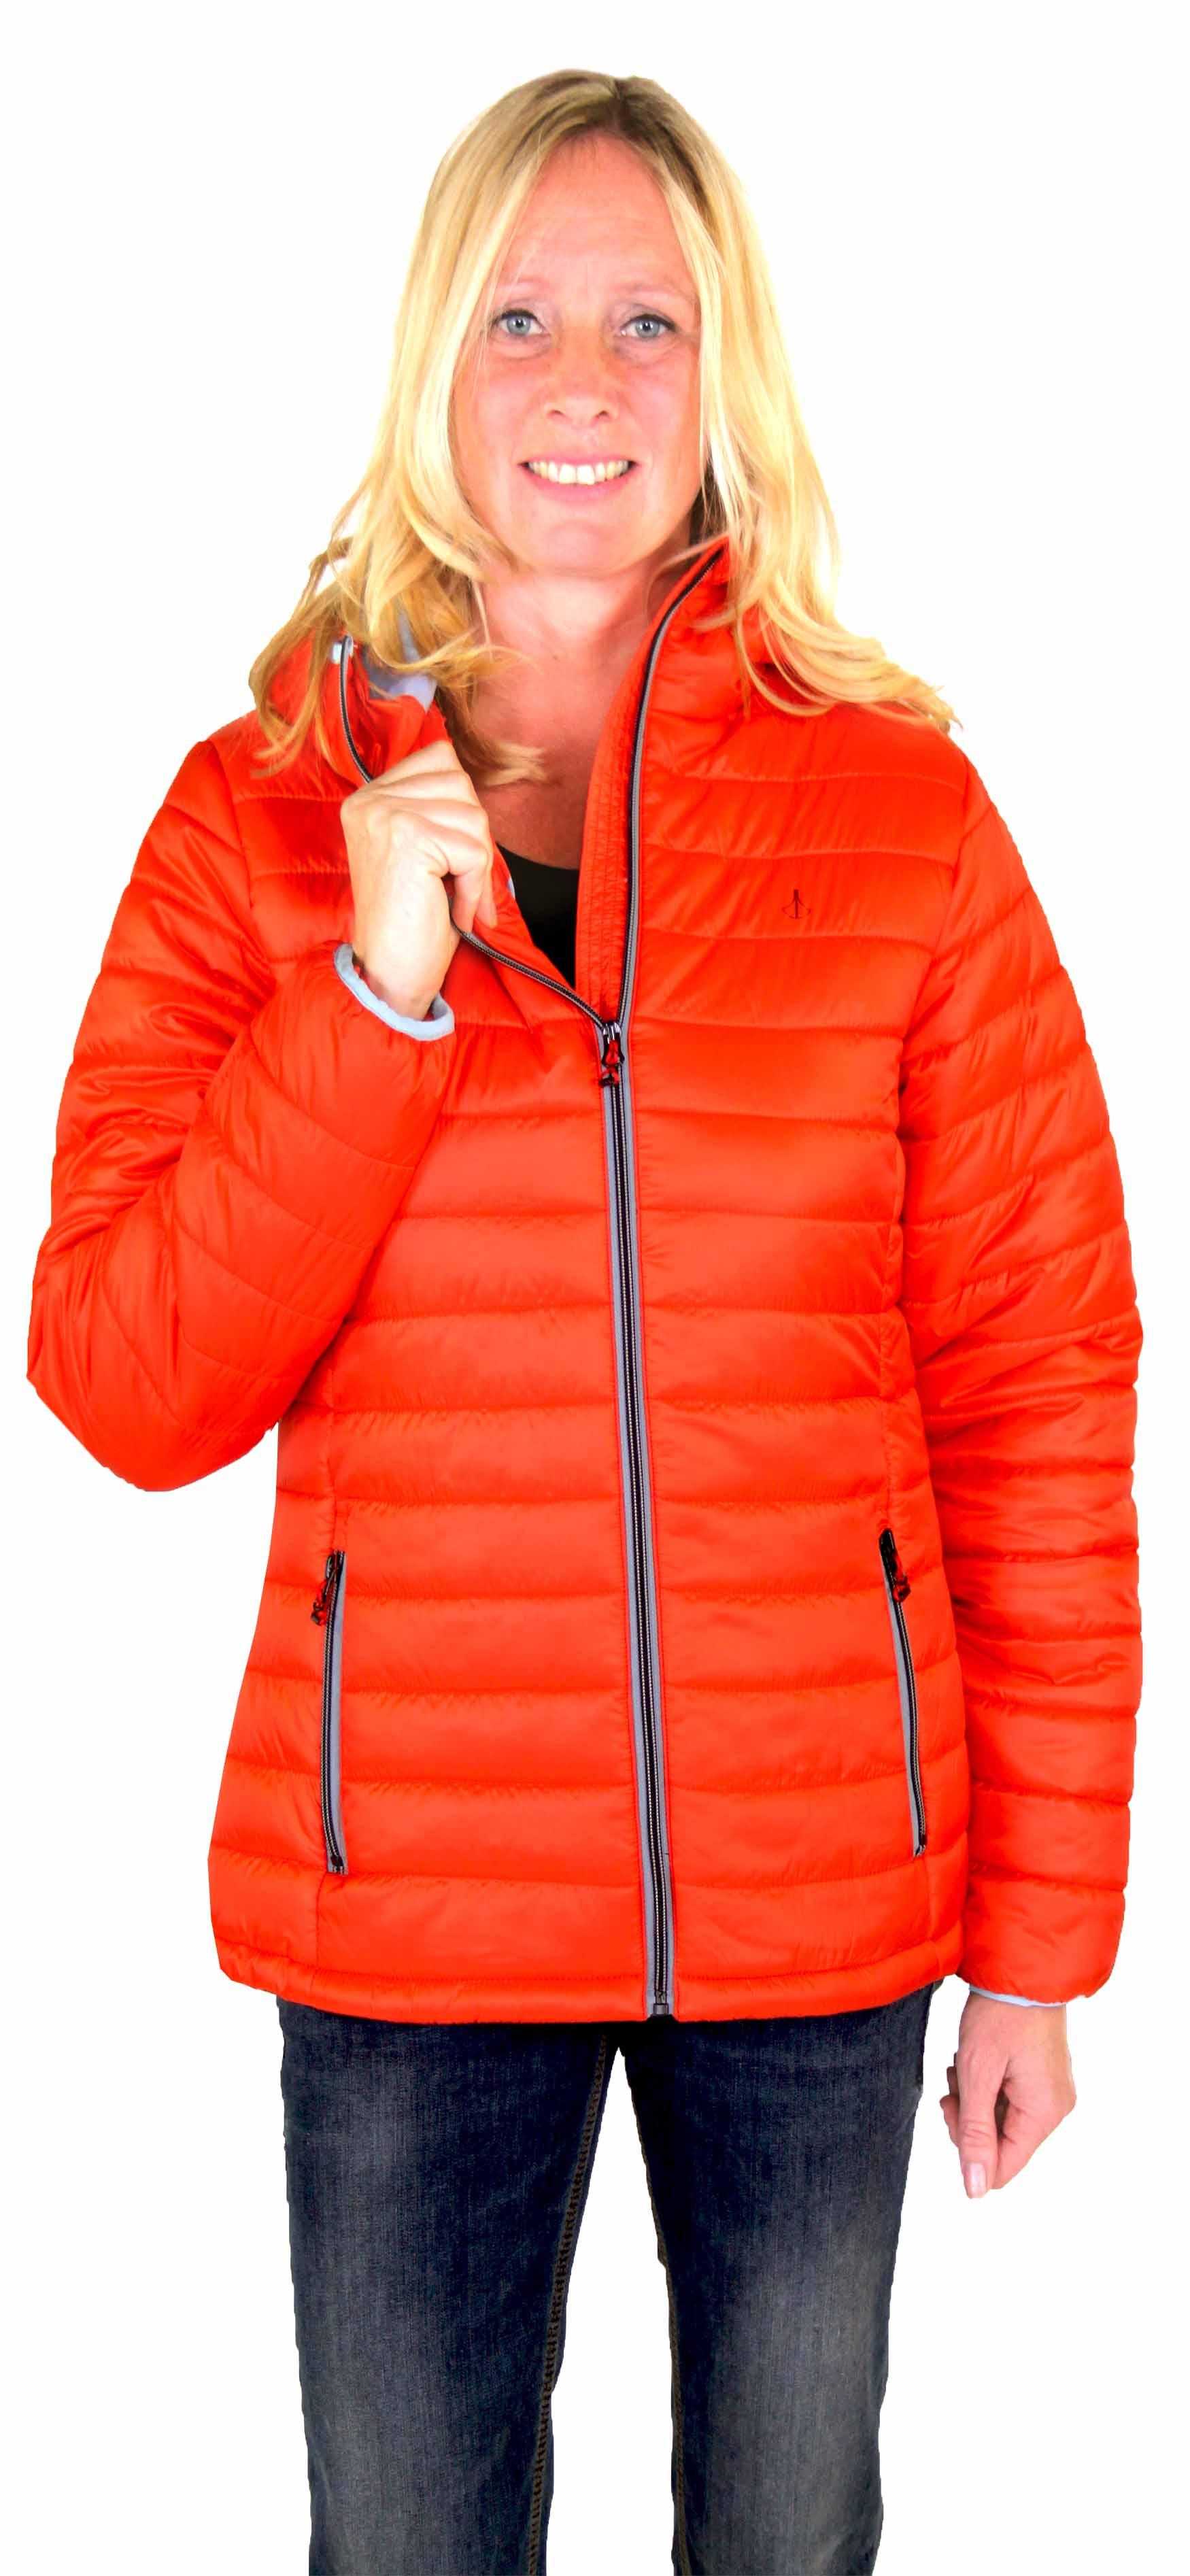 Oranje dames winterjas kopen - Bjornson.nl - Outdoorkleding